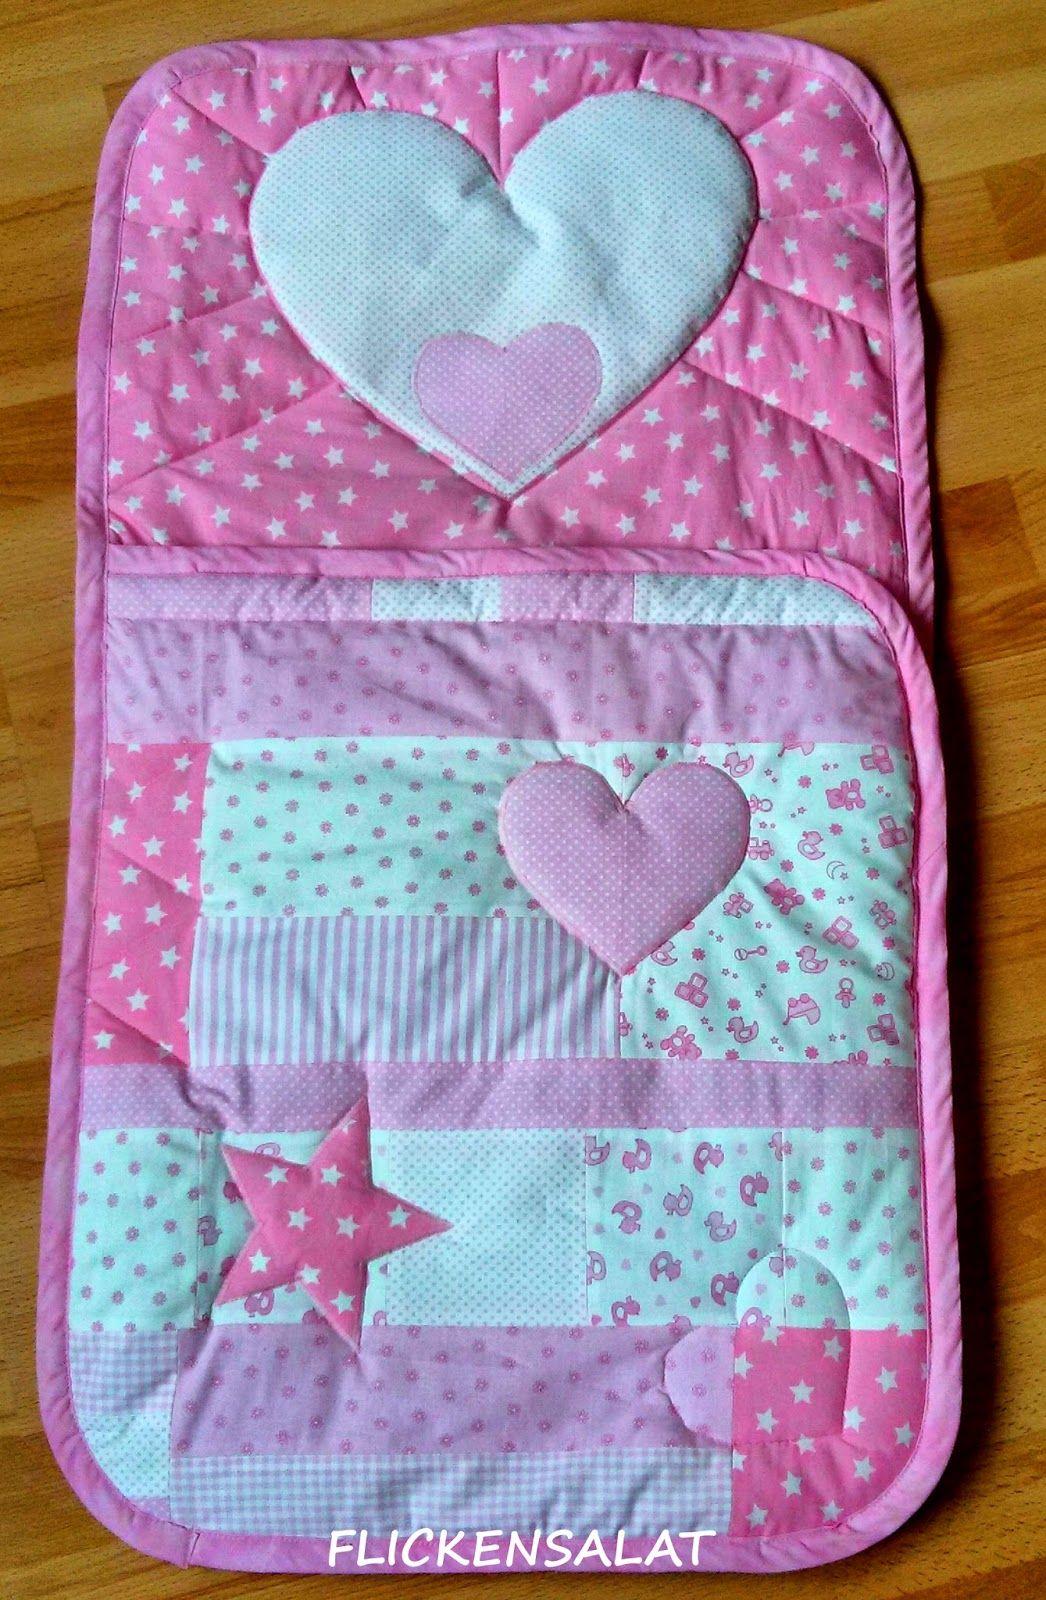 Flickensalat: Baby-Schlafsack, Patchwork Beautiful Baby Sleeping Bag ...